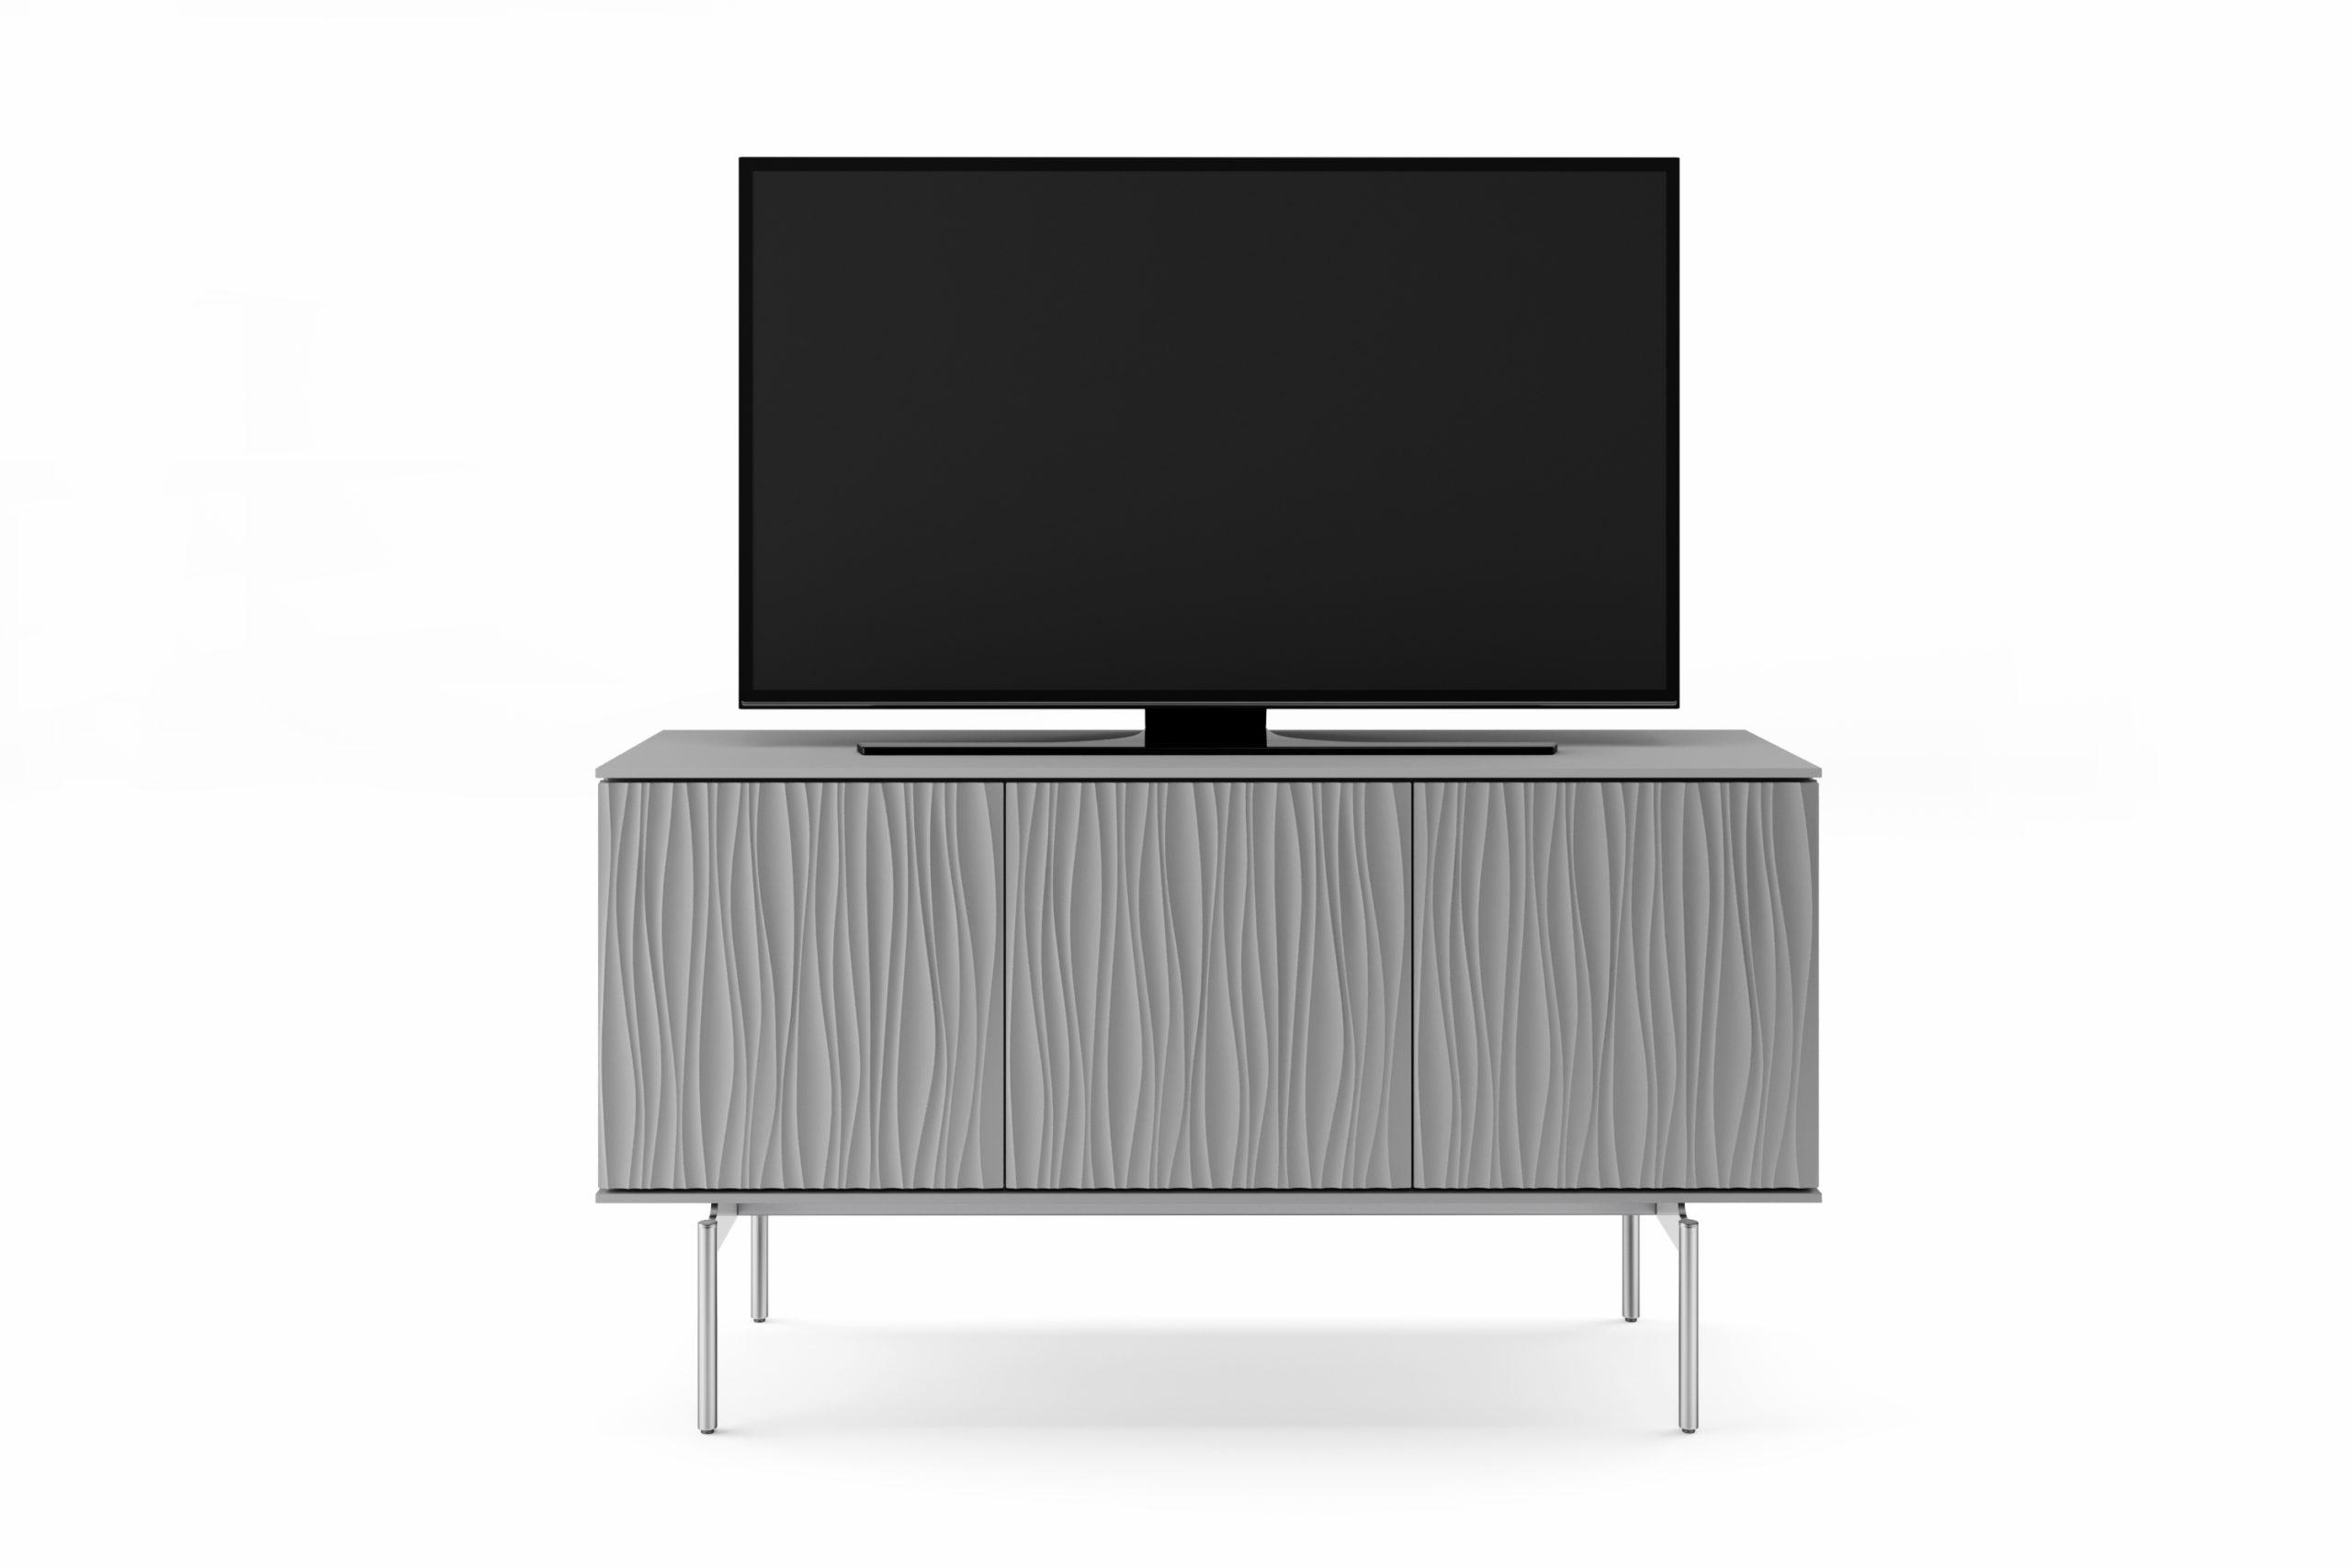 Tanami 7107 Triple-Width Credenza & TV Console | BDI Furniture